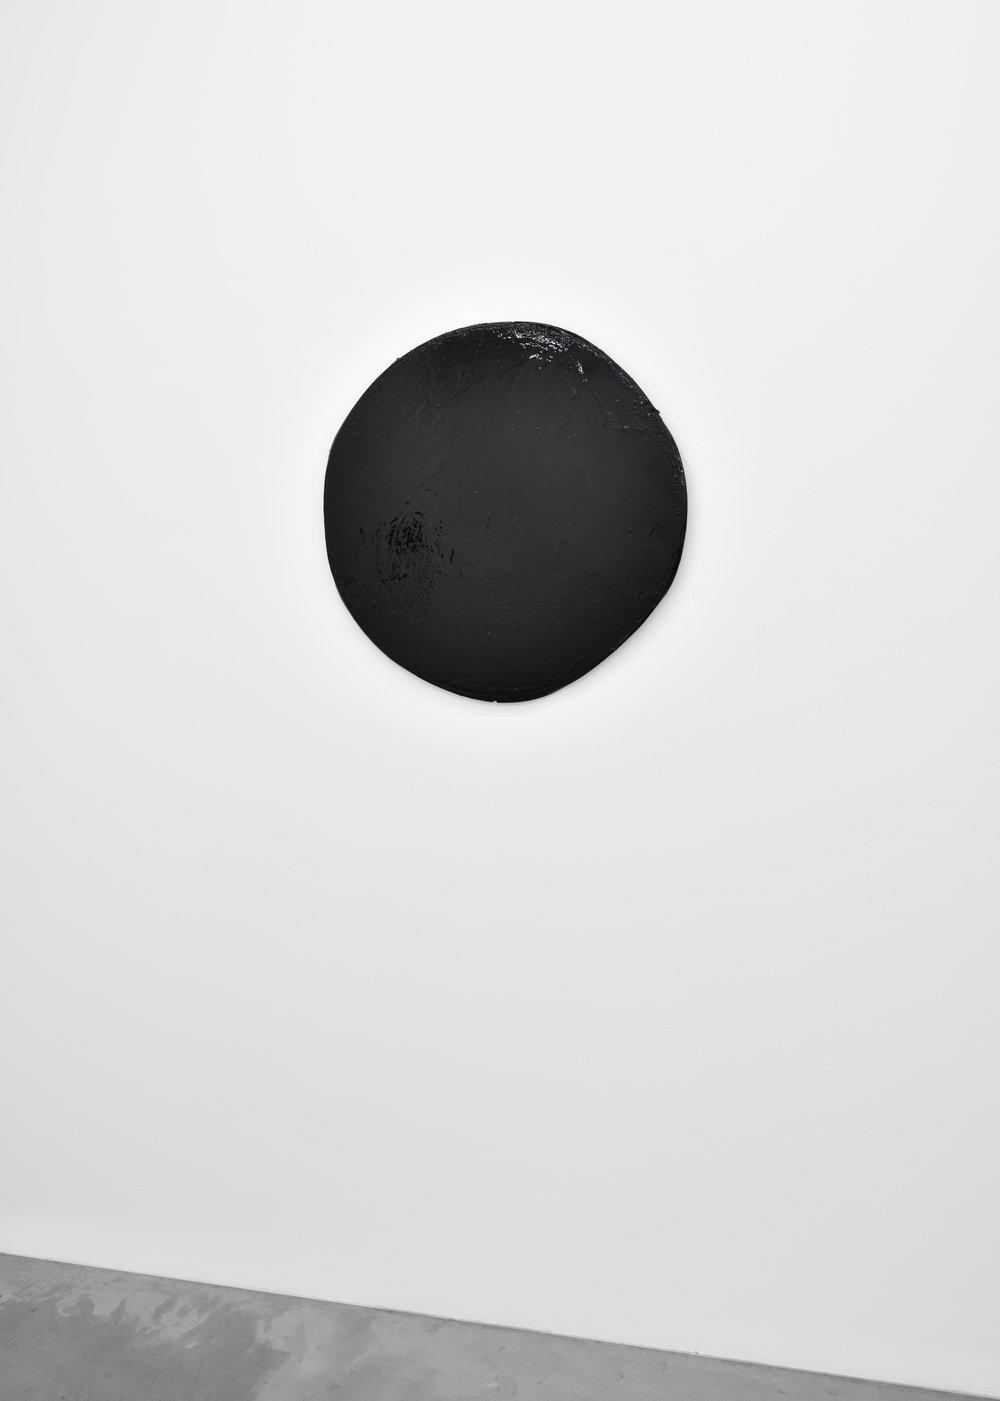 Lucas Jardin  Ring , 2018 Lacquer on aluminium 72 x 72 cm 28 11/32 x 28 11/32 inches